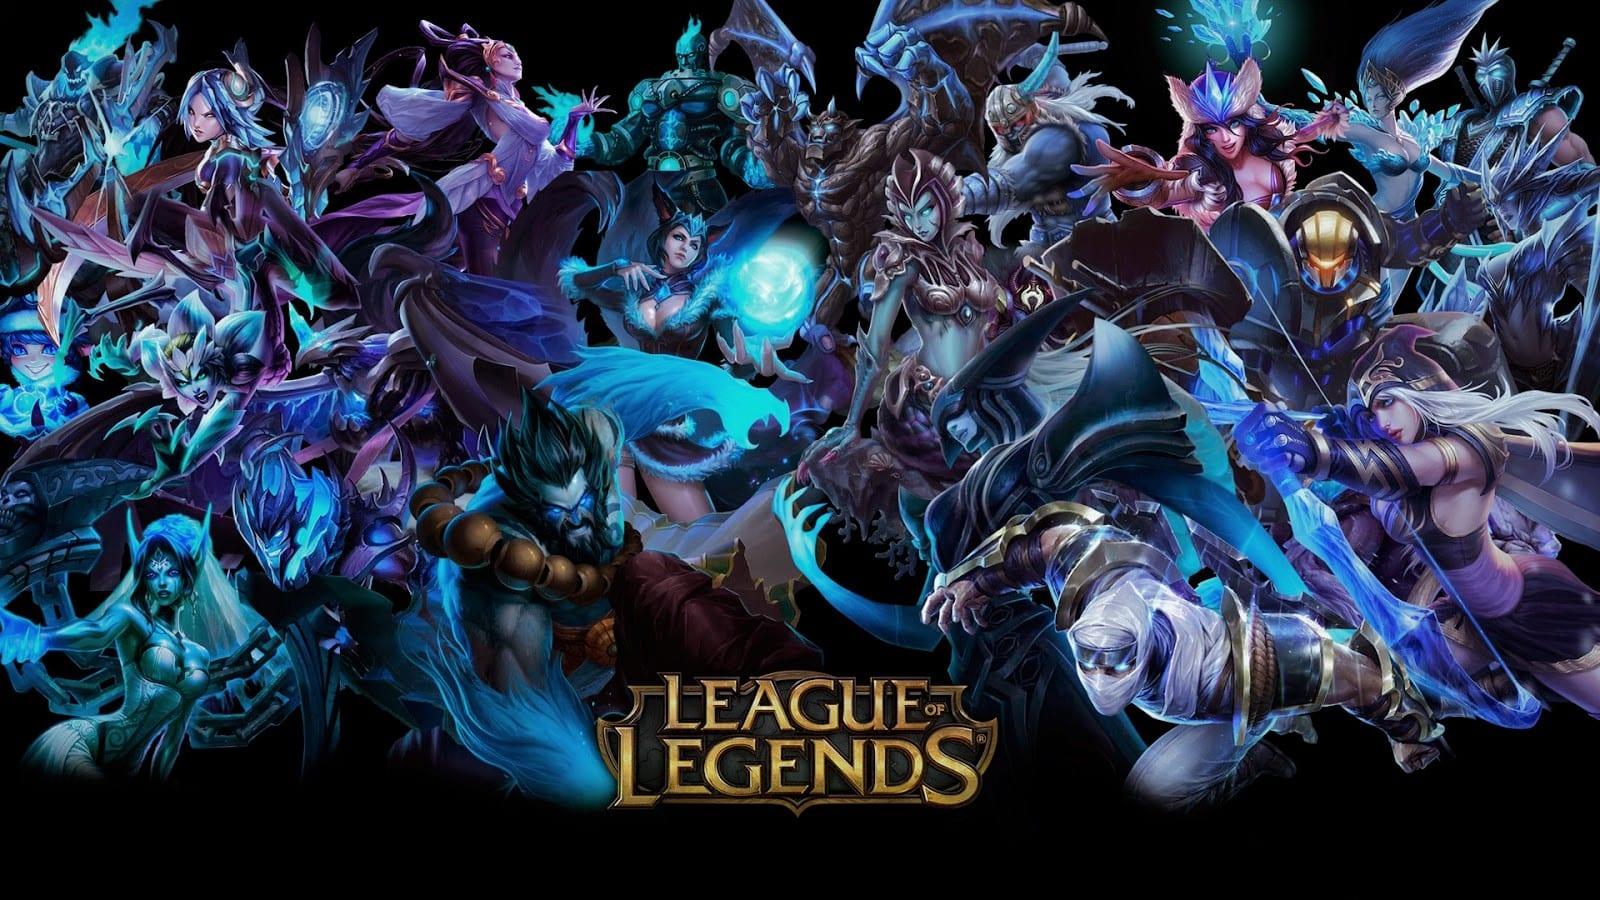 league of legends en iyi support herolari